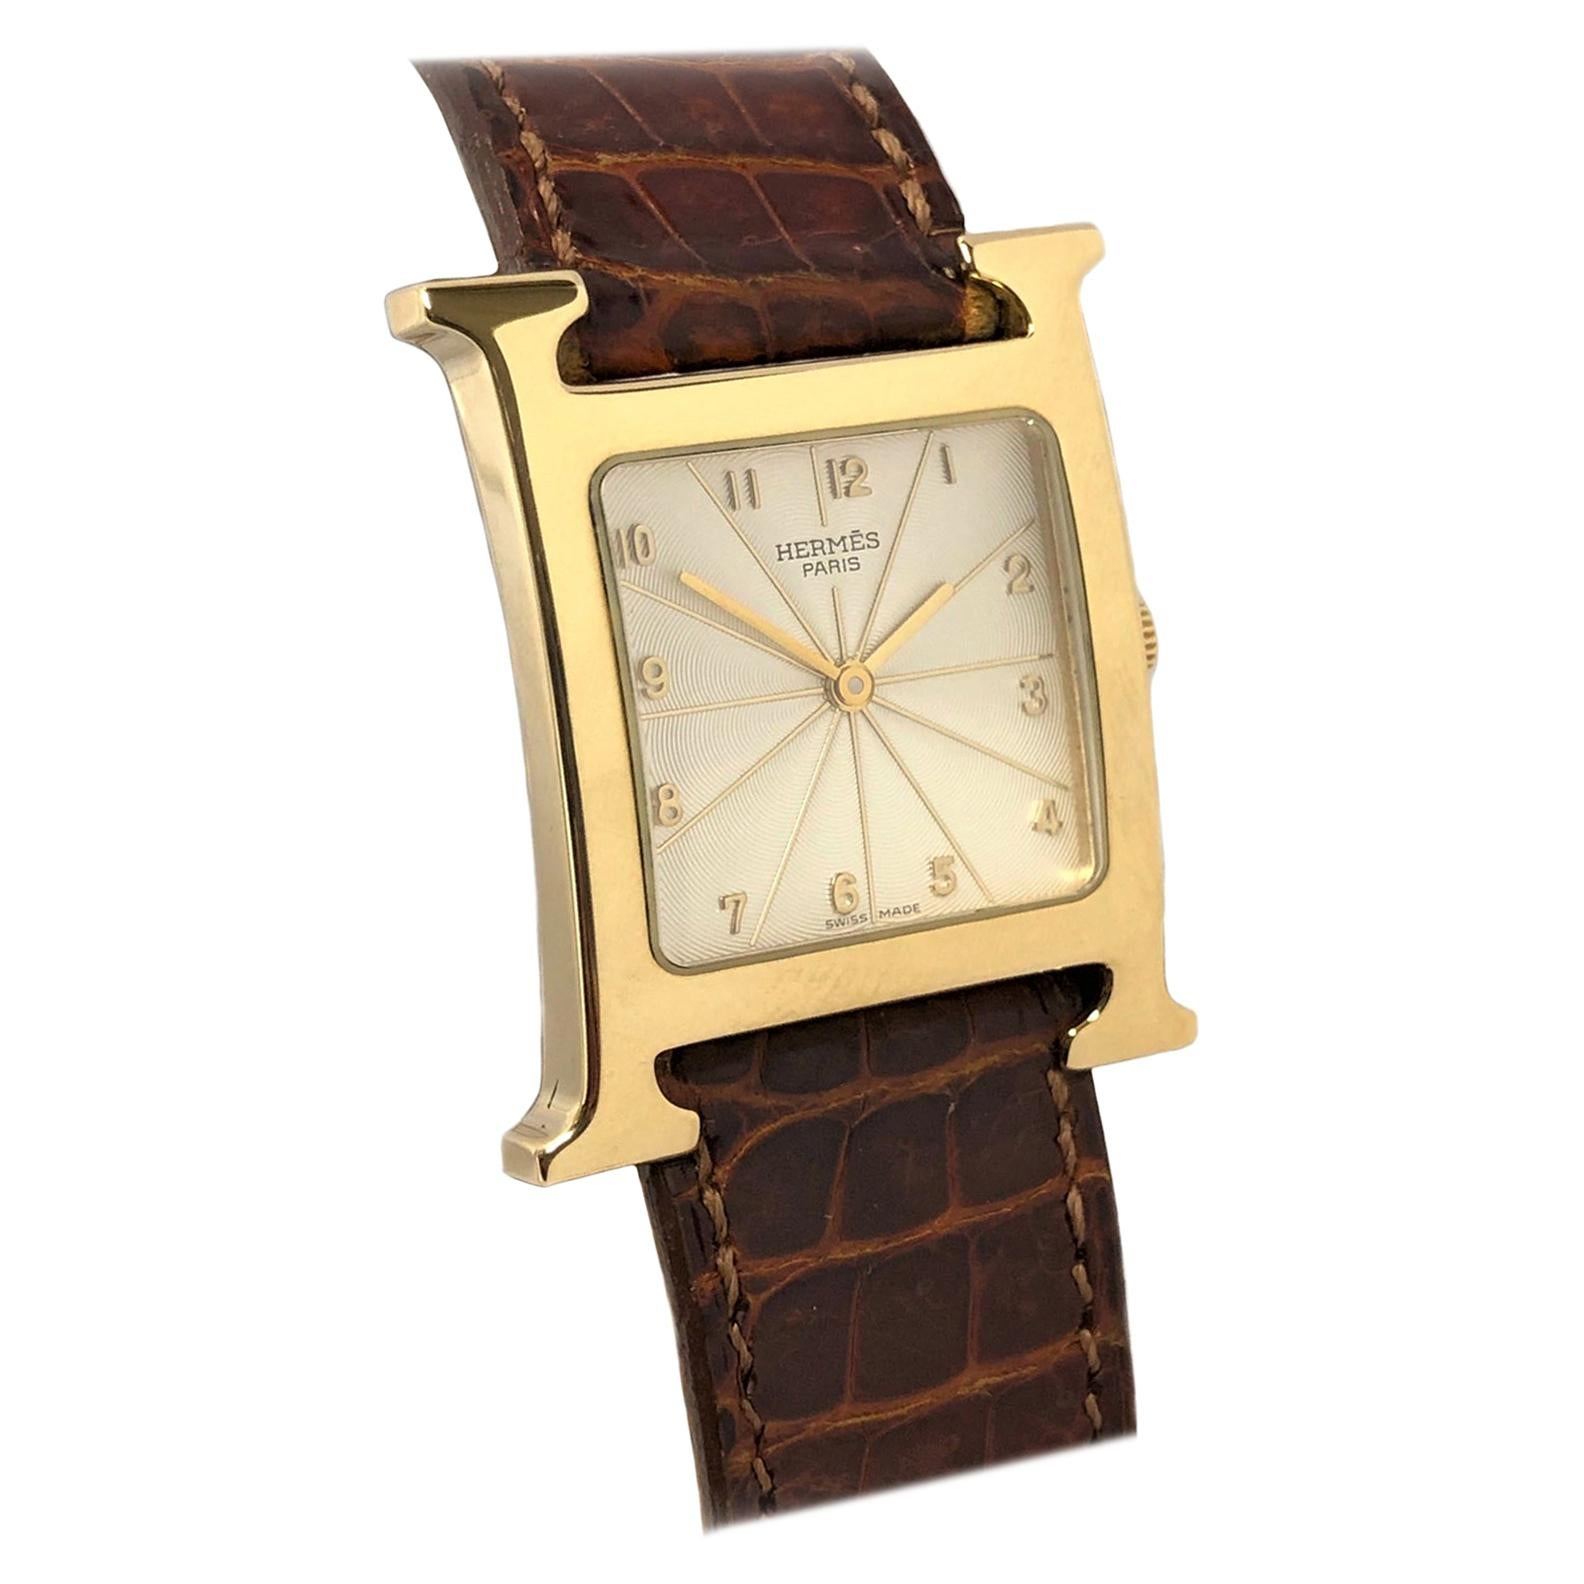 Hermès Heure H Large Yellow Gold Quartz Wristwatch